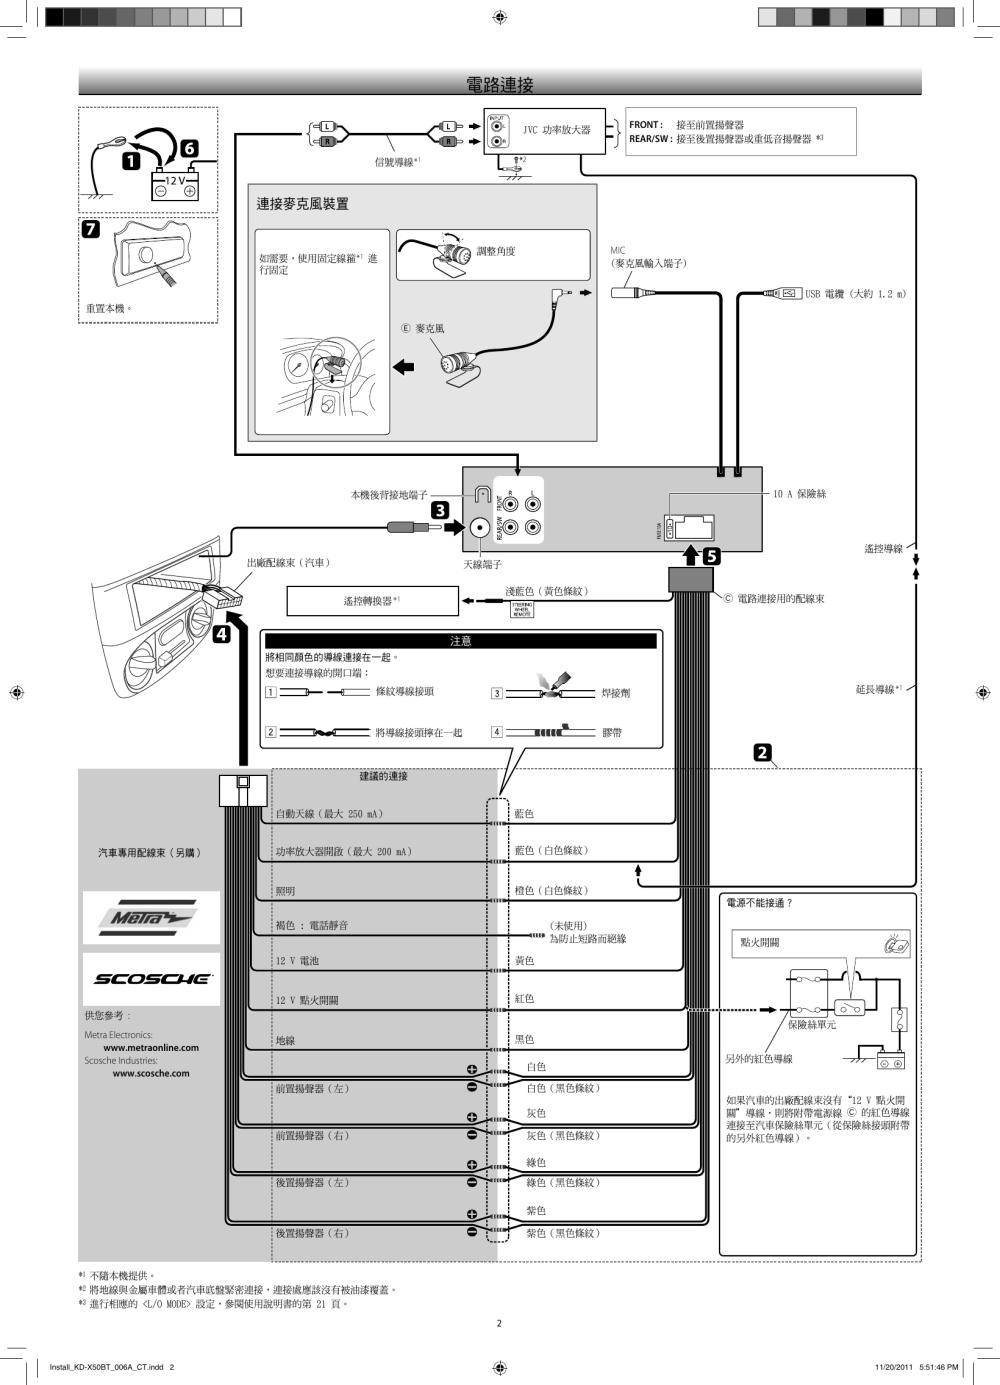 medium resolution of jvc kd r310 wiring diagram another wiring diagram jvc kd r310 wiring diagram